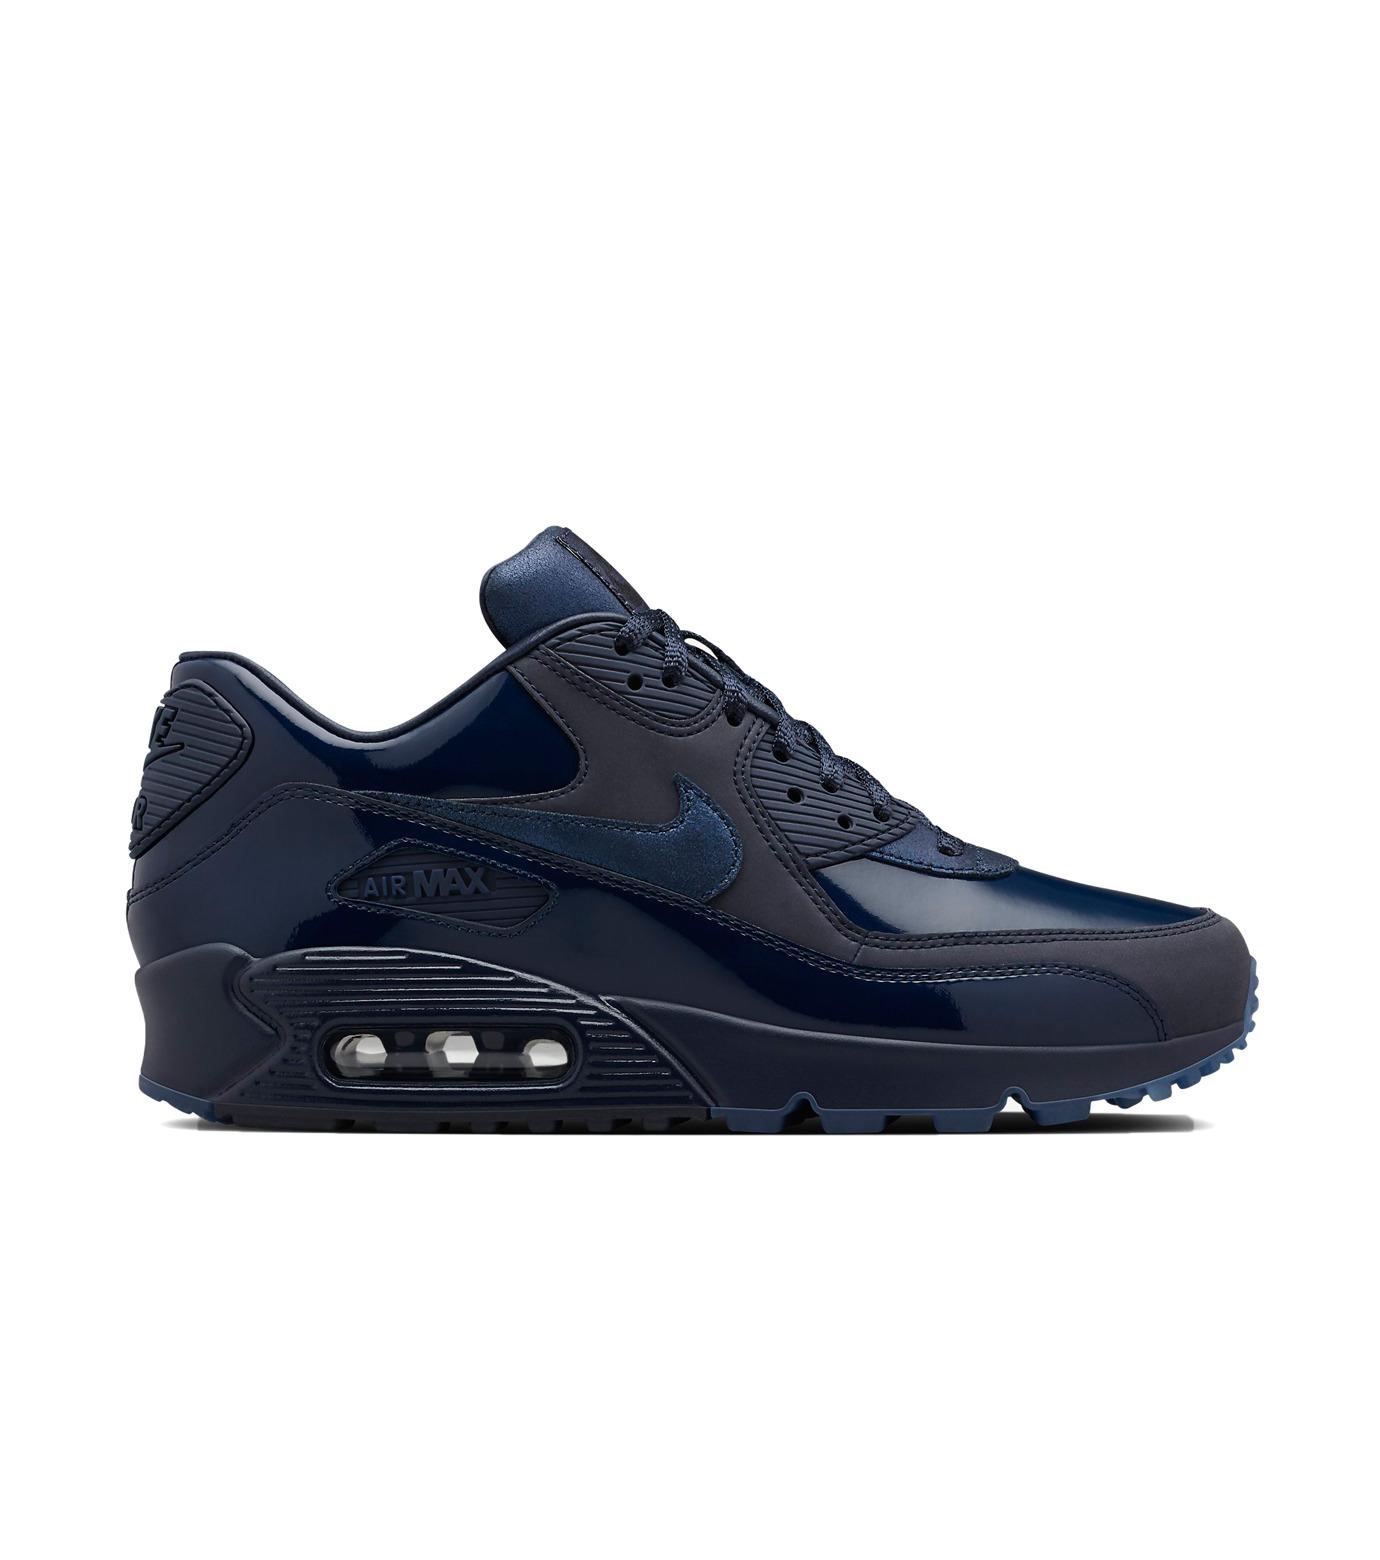 NIKE(ナイキ)のWMNS AIR MAX PEDRO LOURENCO-BLUE(シューズ/shoes)-867116-400-92 拡大詳細画像1